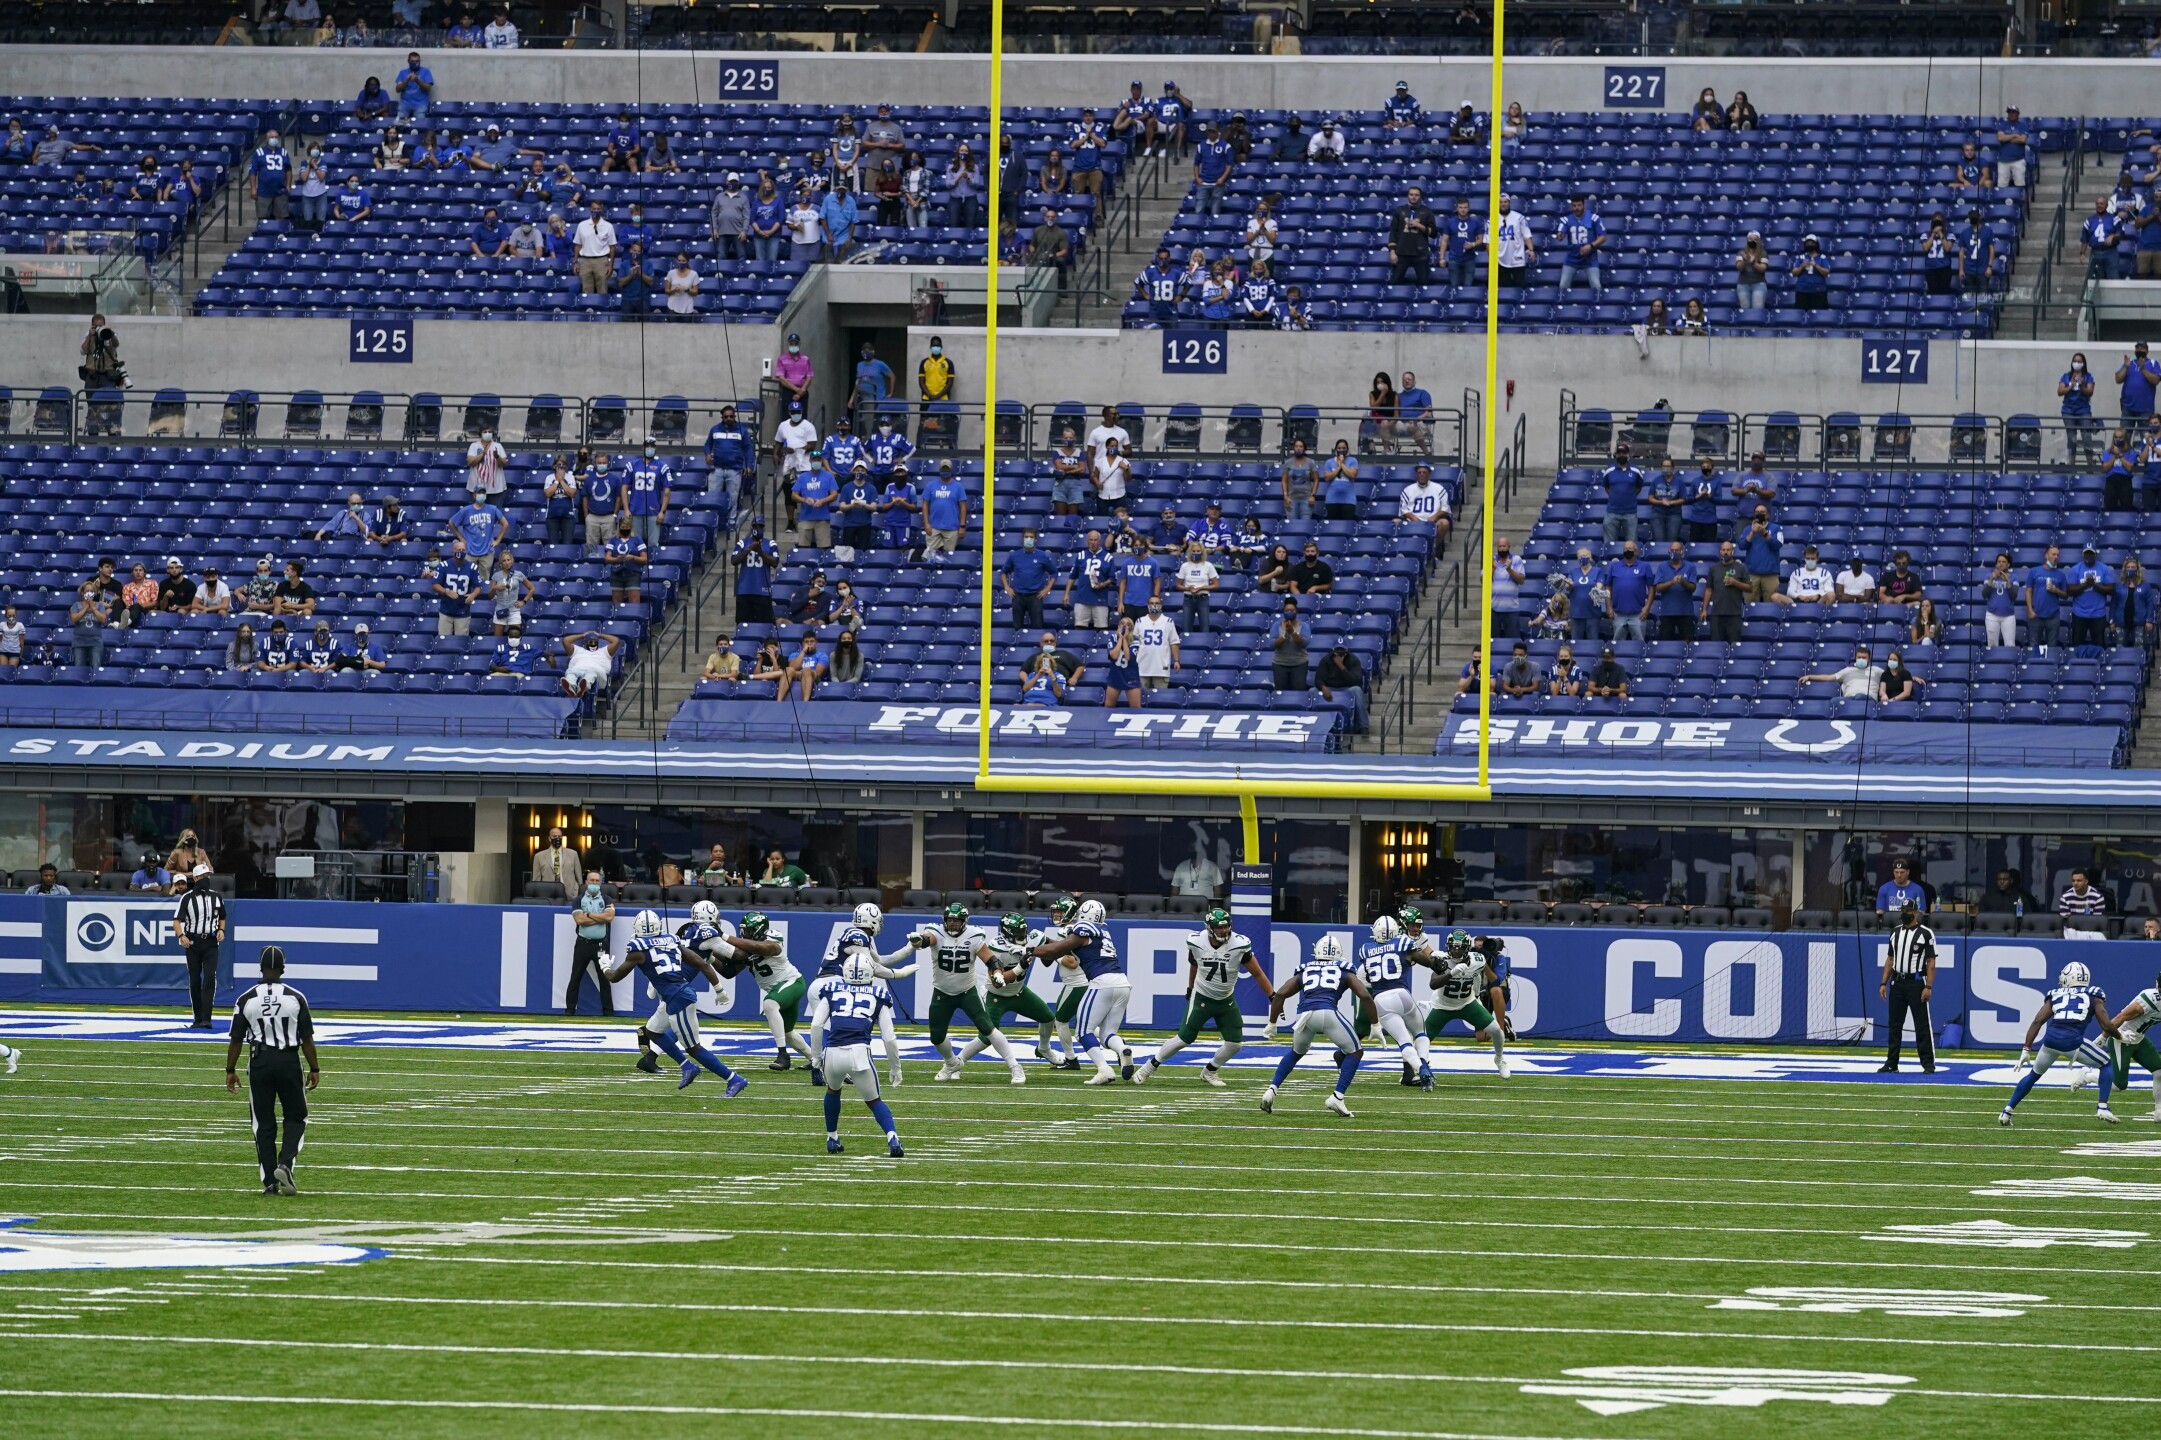 Jets Colts Football